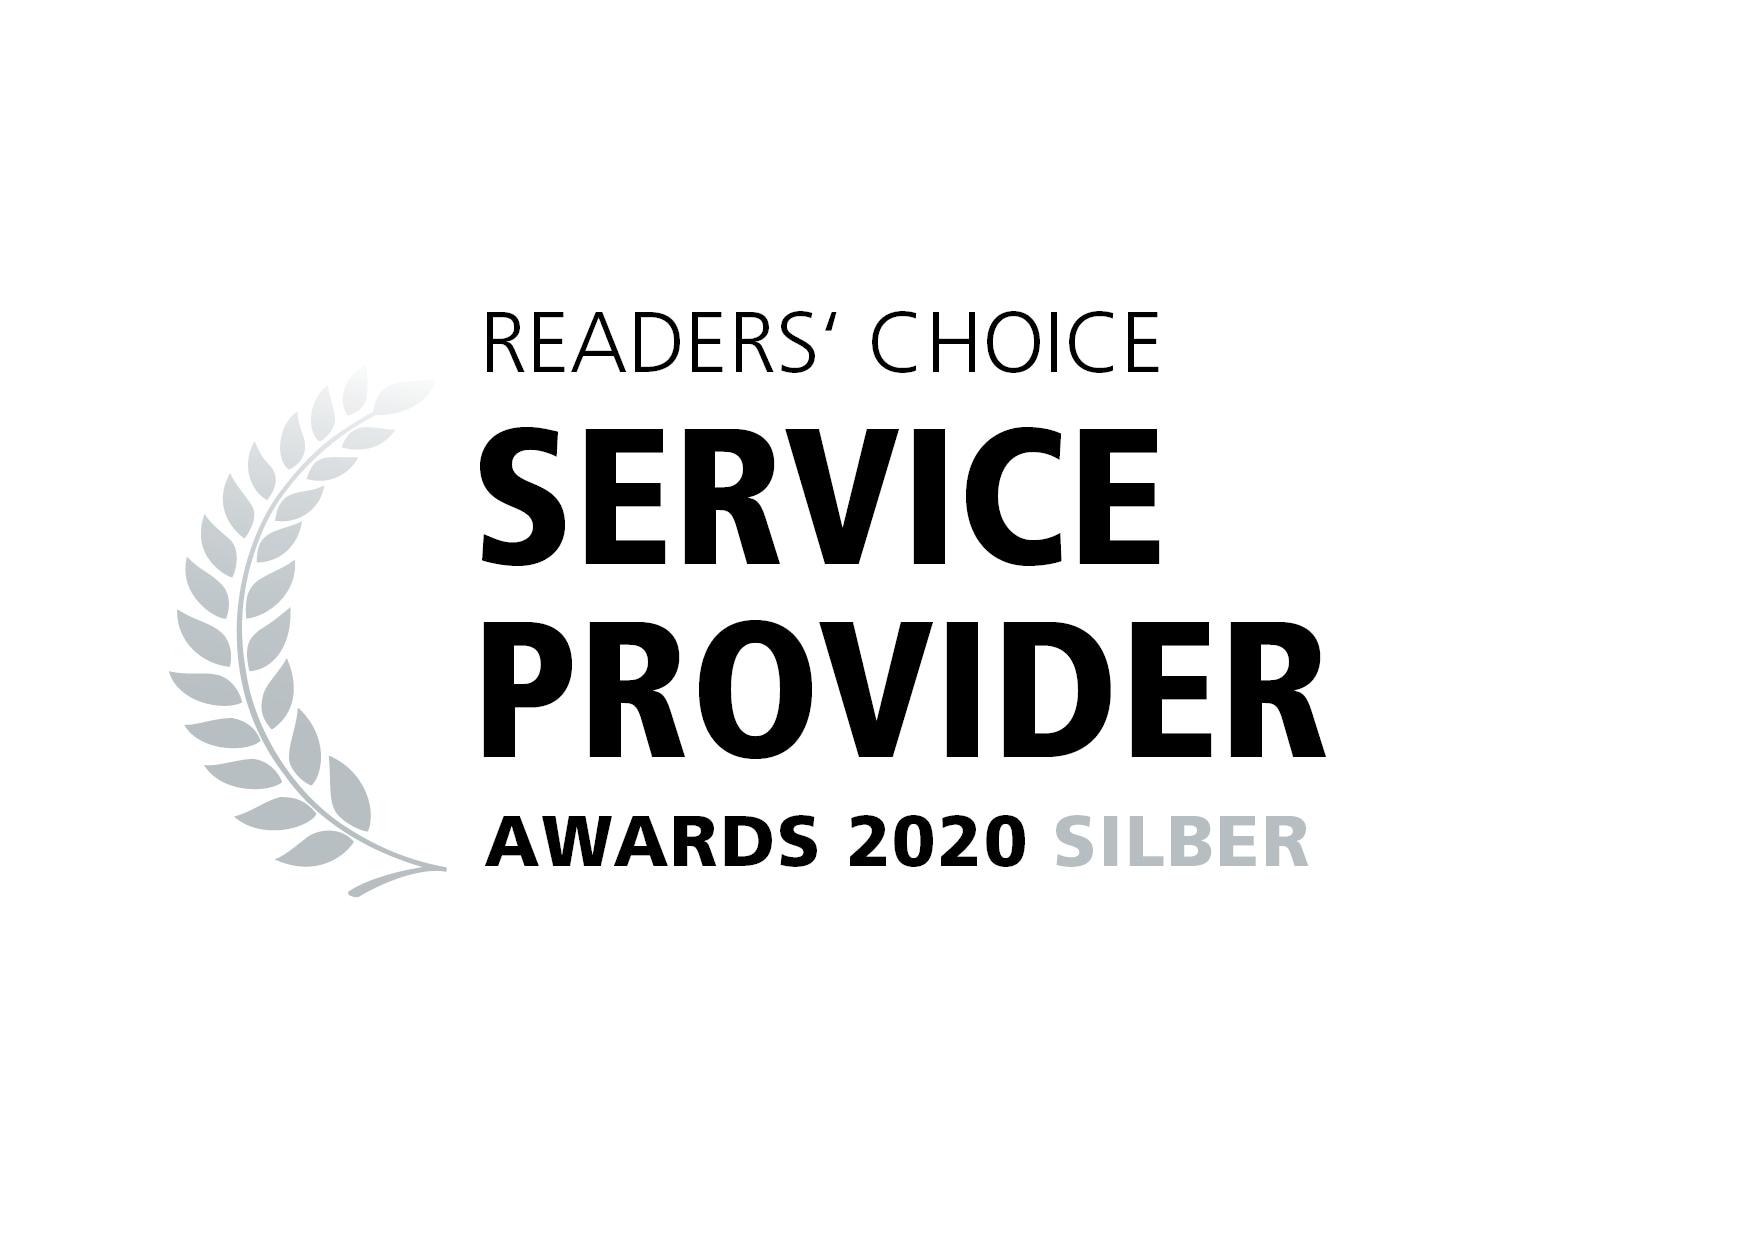 SP AWARD Logo 2020 SILBER1